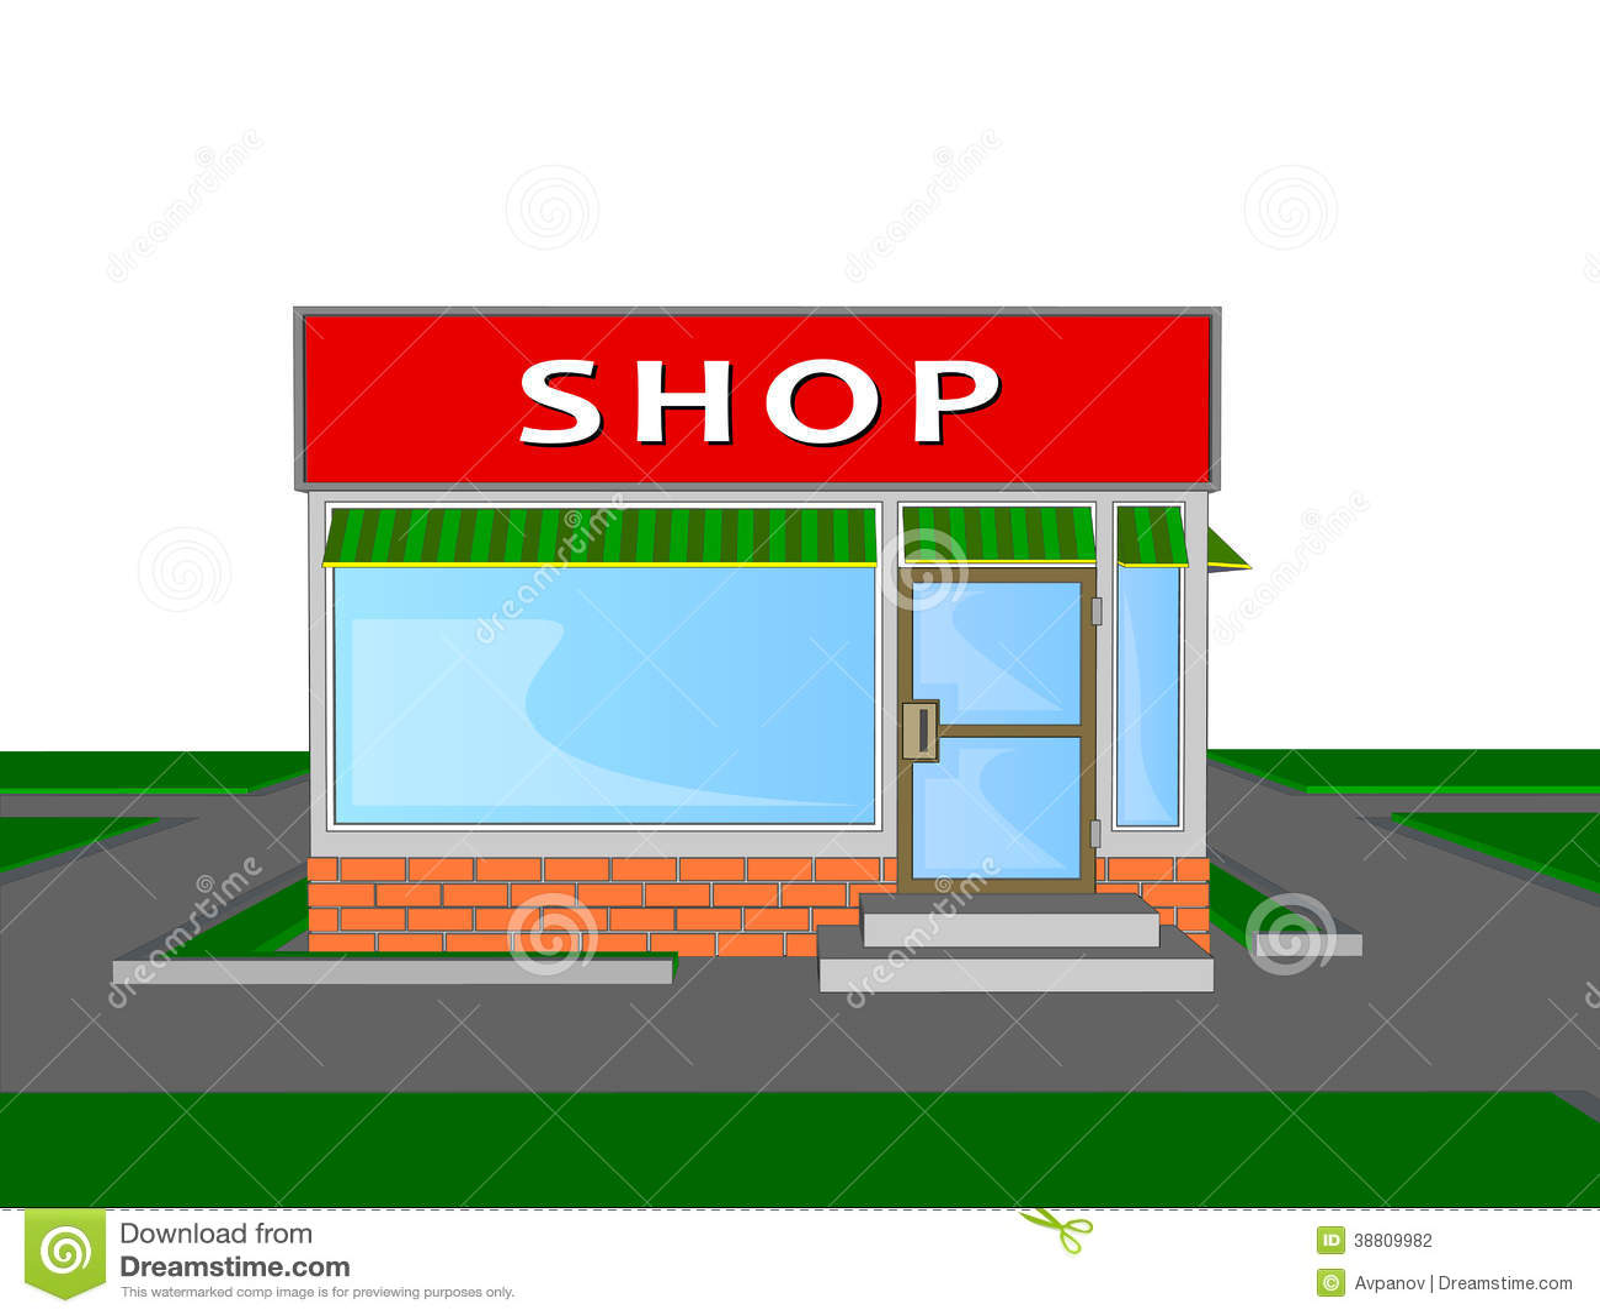 retail store clip art free - photo #24